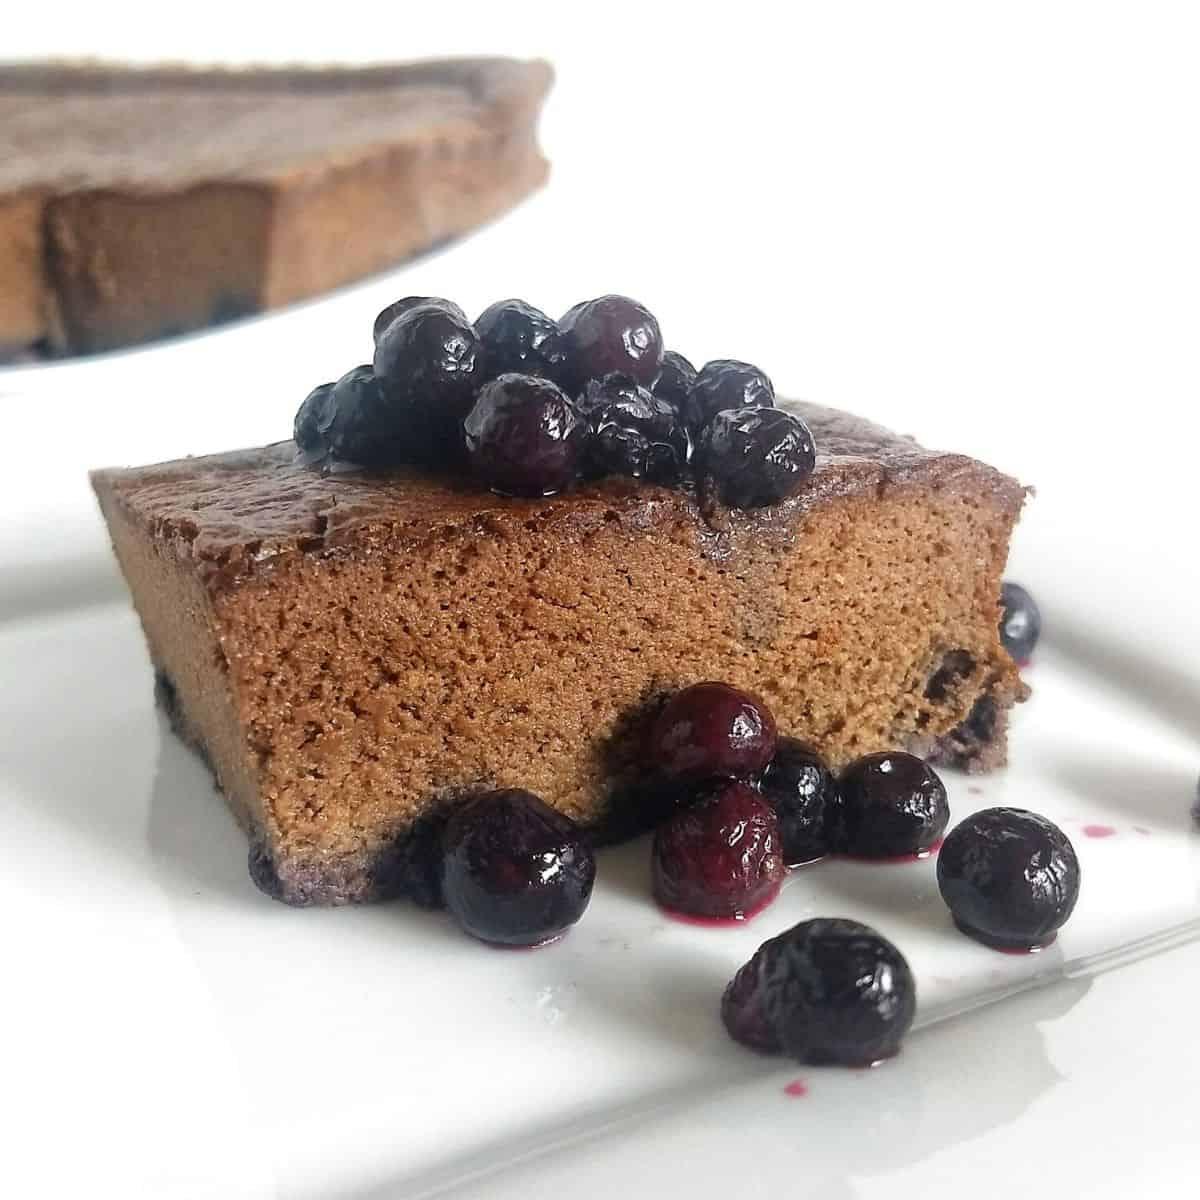 3 2 - Keto Coconut Flour Recipes: Desserts to Dinners